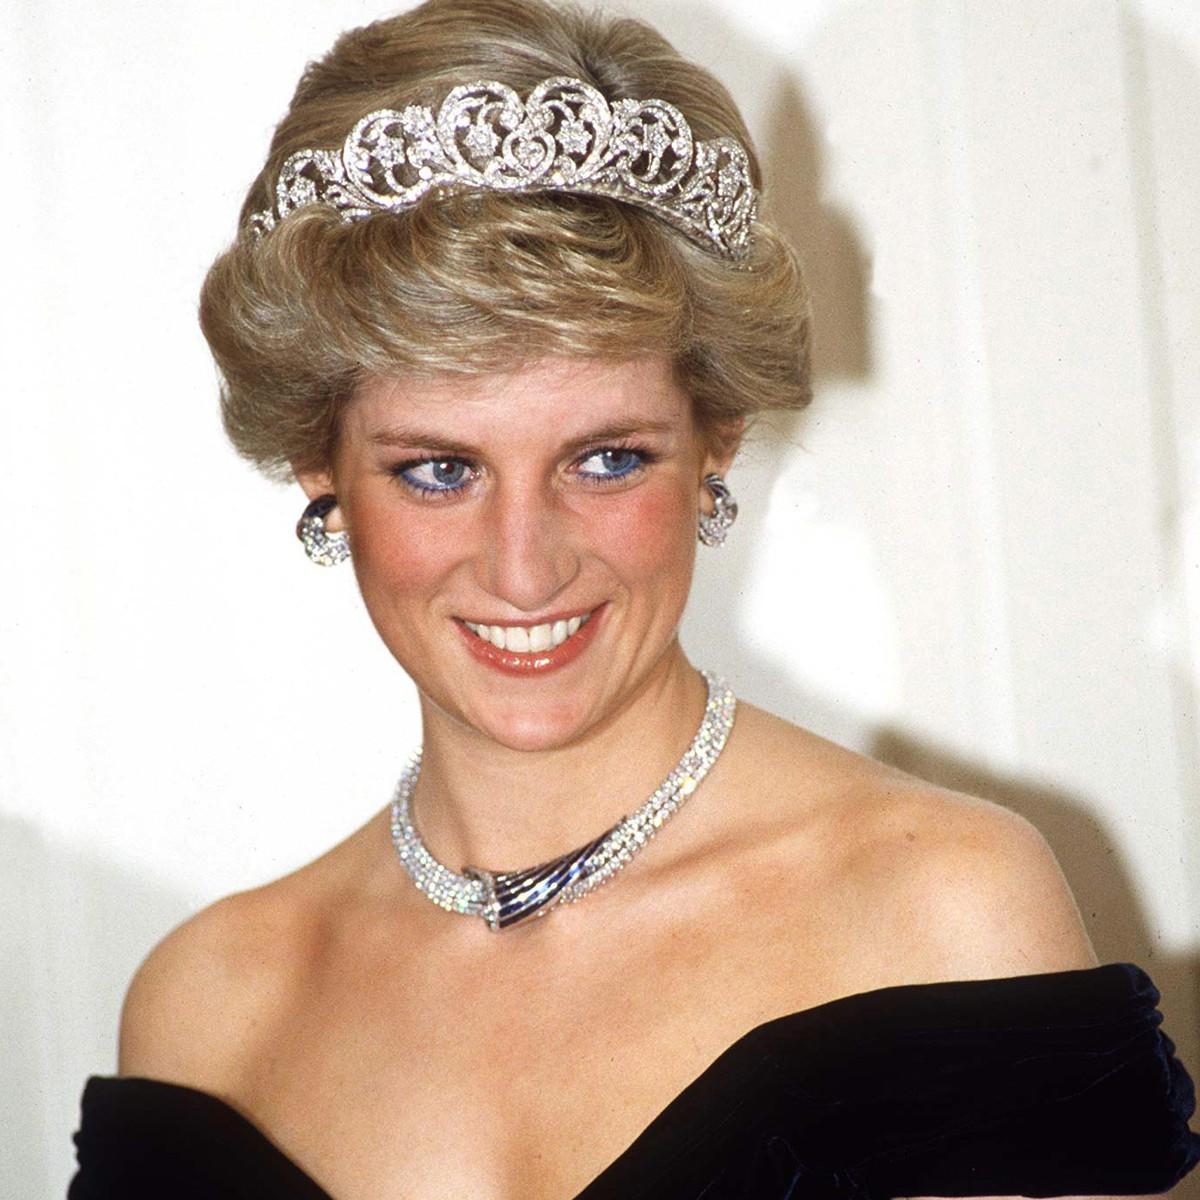 princess_diana_wearing_black_dress_with_tiara-blue_eyeliner-skincare_makeup_and_beauty_secrets-120814